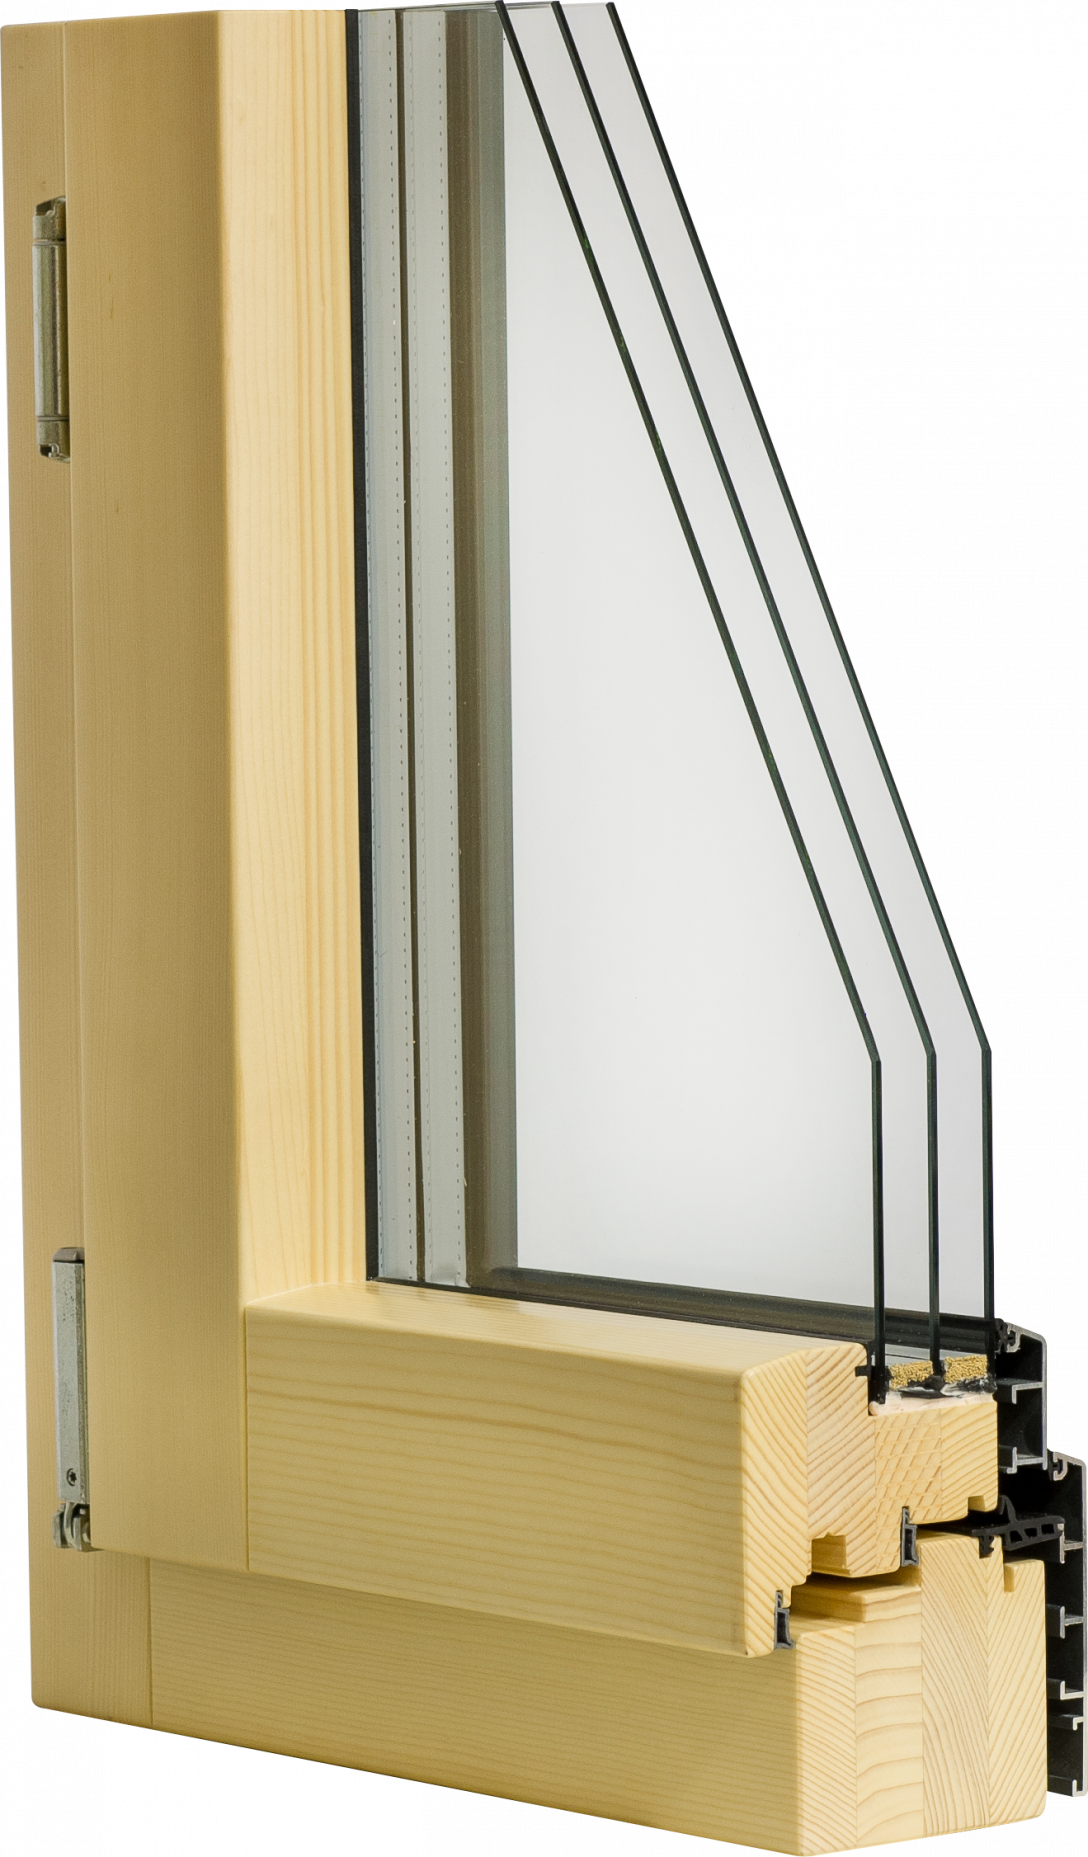 Large Size of Holz Alu Fenster Preise Aluminium Kosten Preisunterschied Preis Unilux Holz Alu Erfahrungen Preisliste Preisvergleich Leistung Bett Massivholz Regal Weiß Fenster Holz Alu Fenster Preise